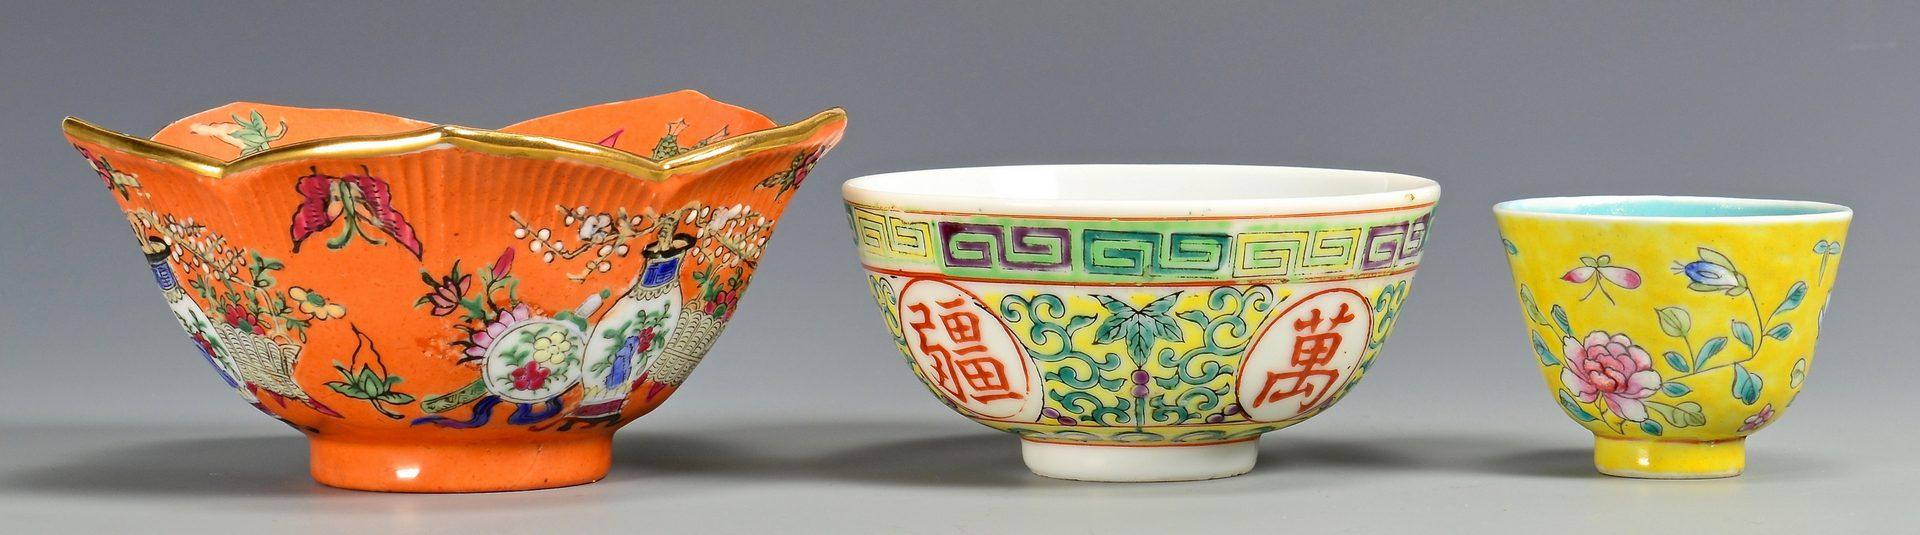 Lot 127: Misc. Asian Porcelain & Snuff Bottles